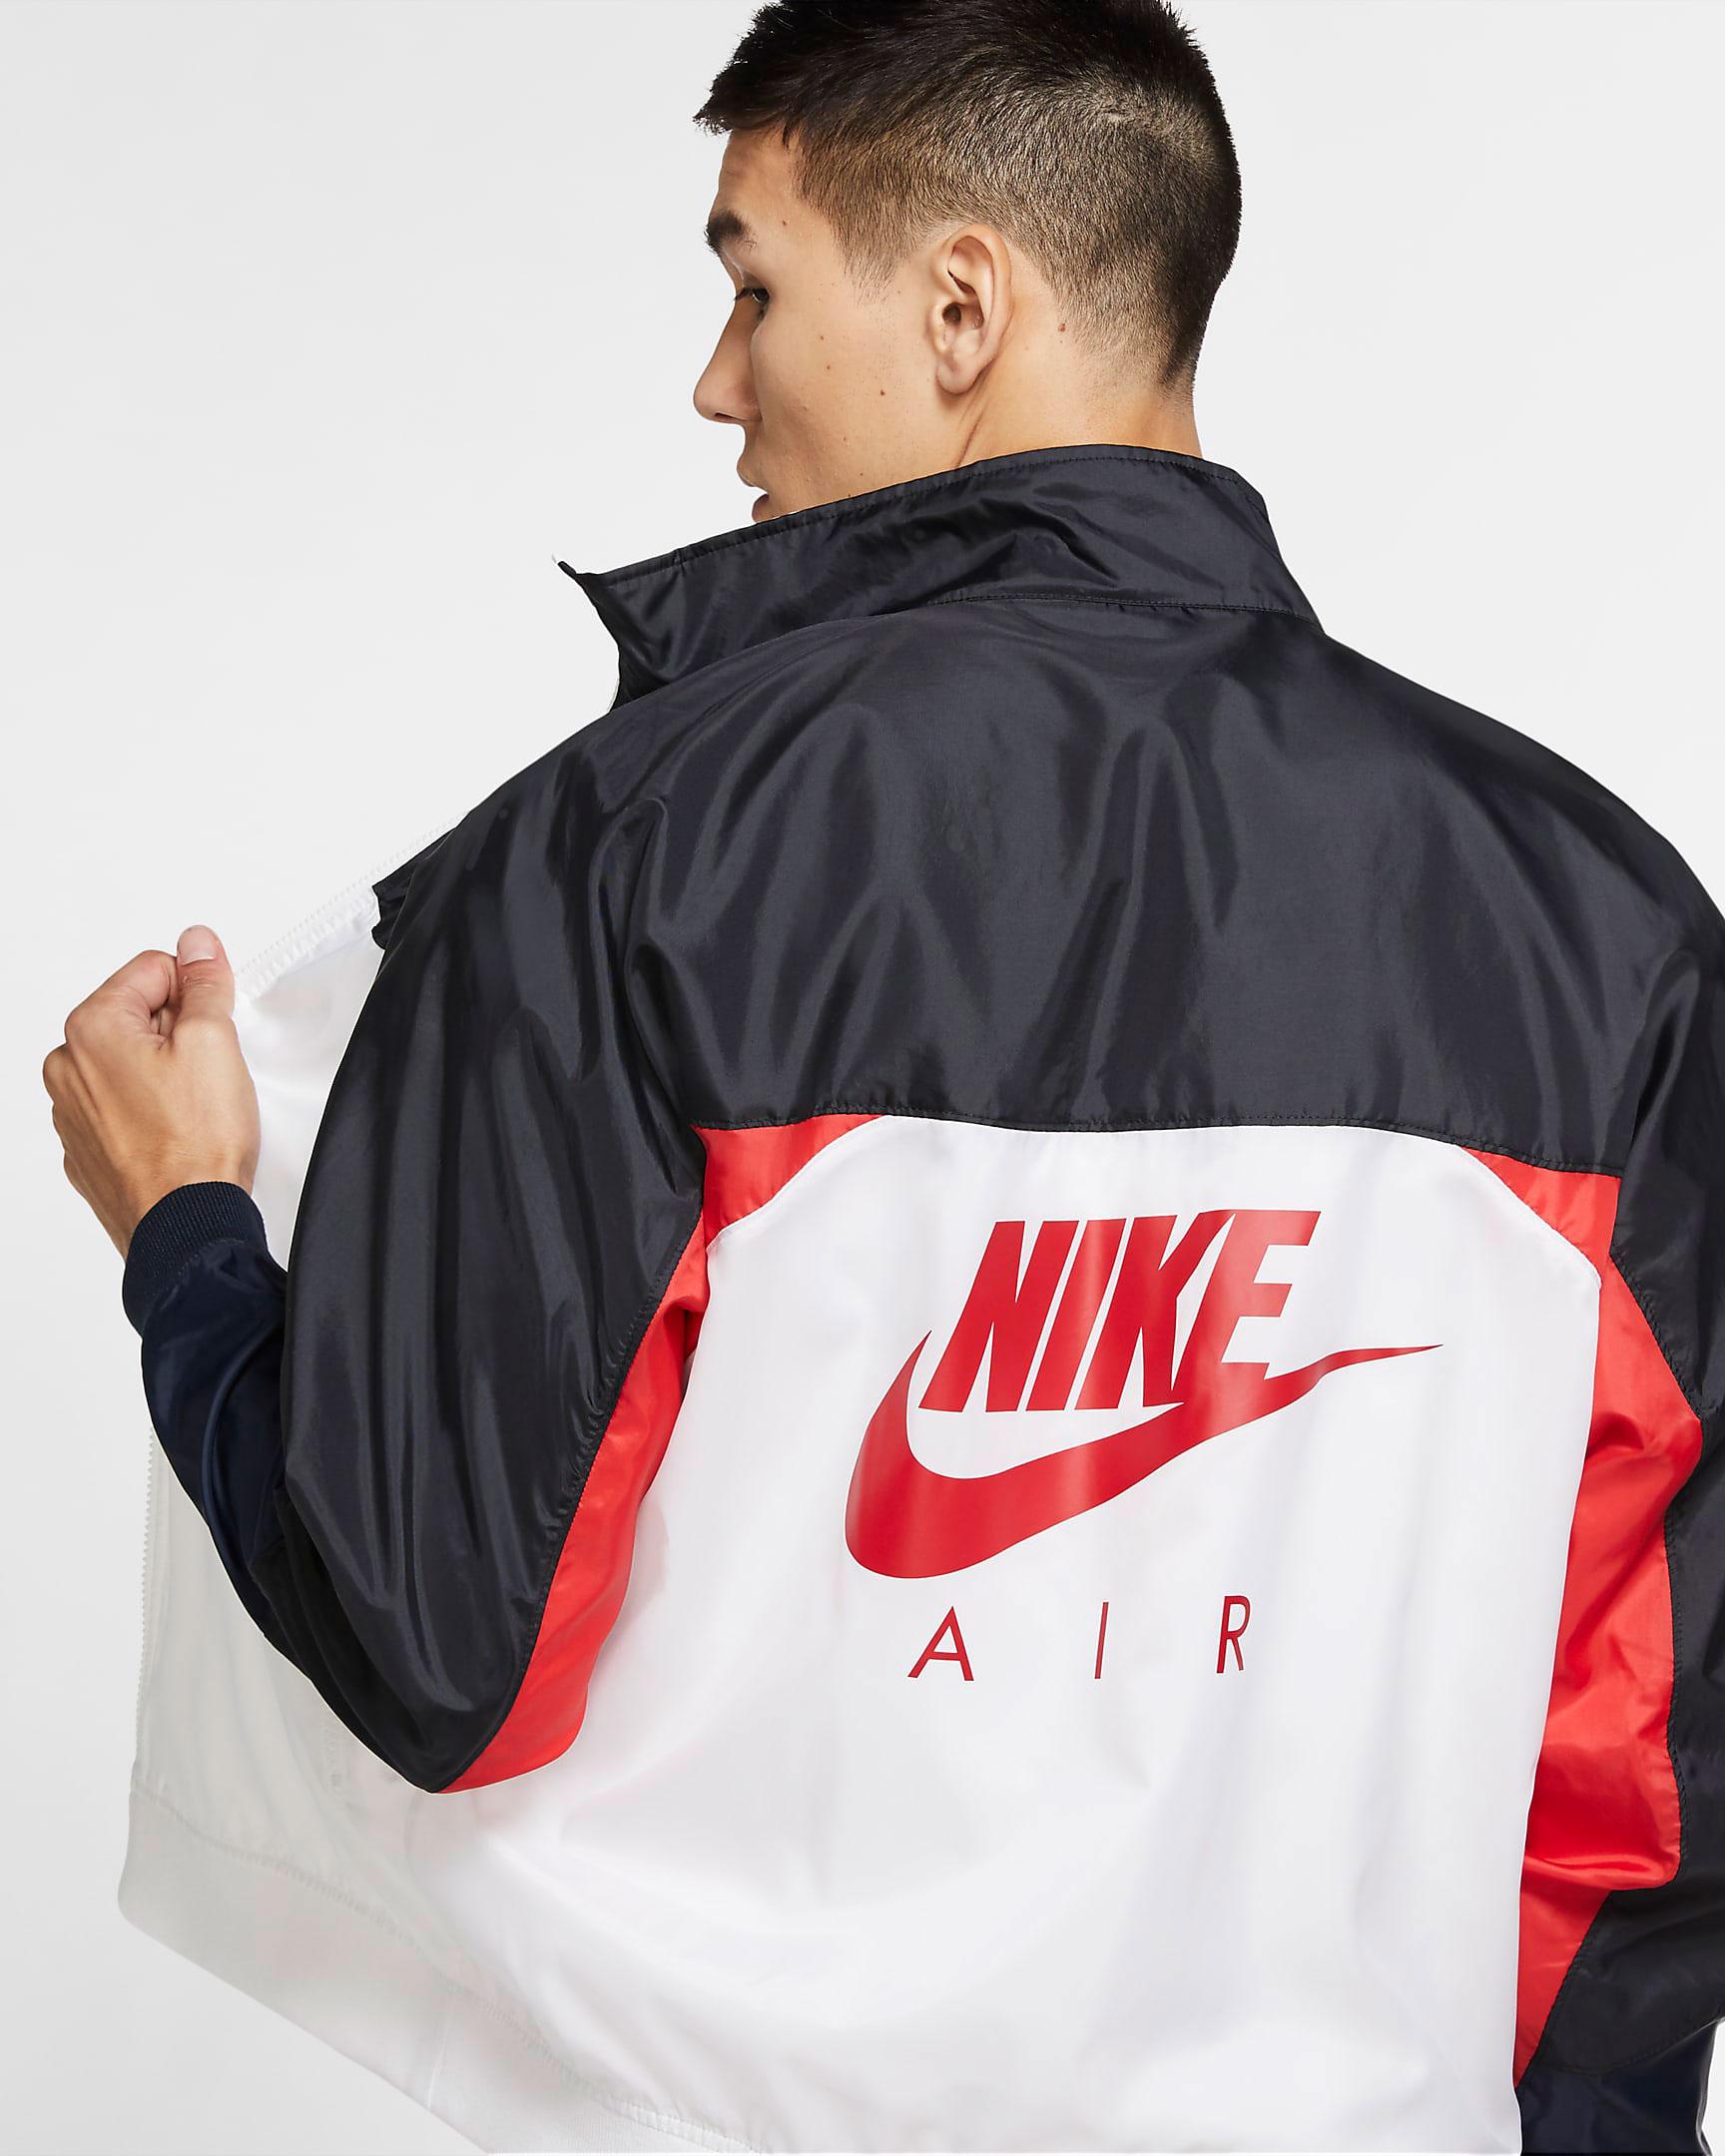 air-jordan-3-denim-fire-red-jacket-4